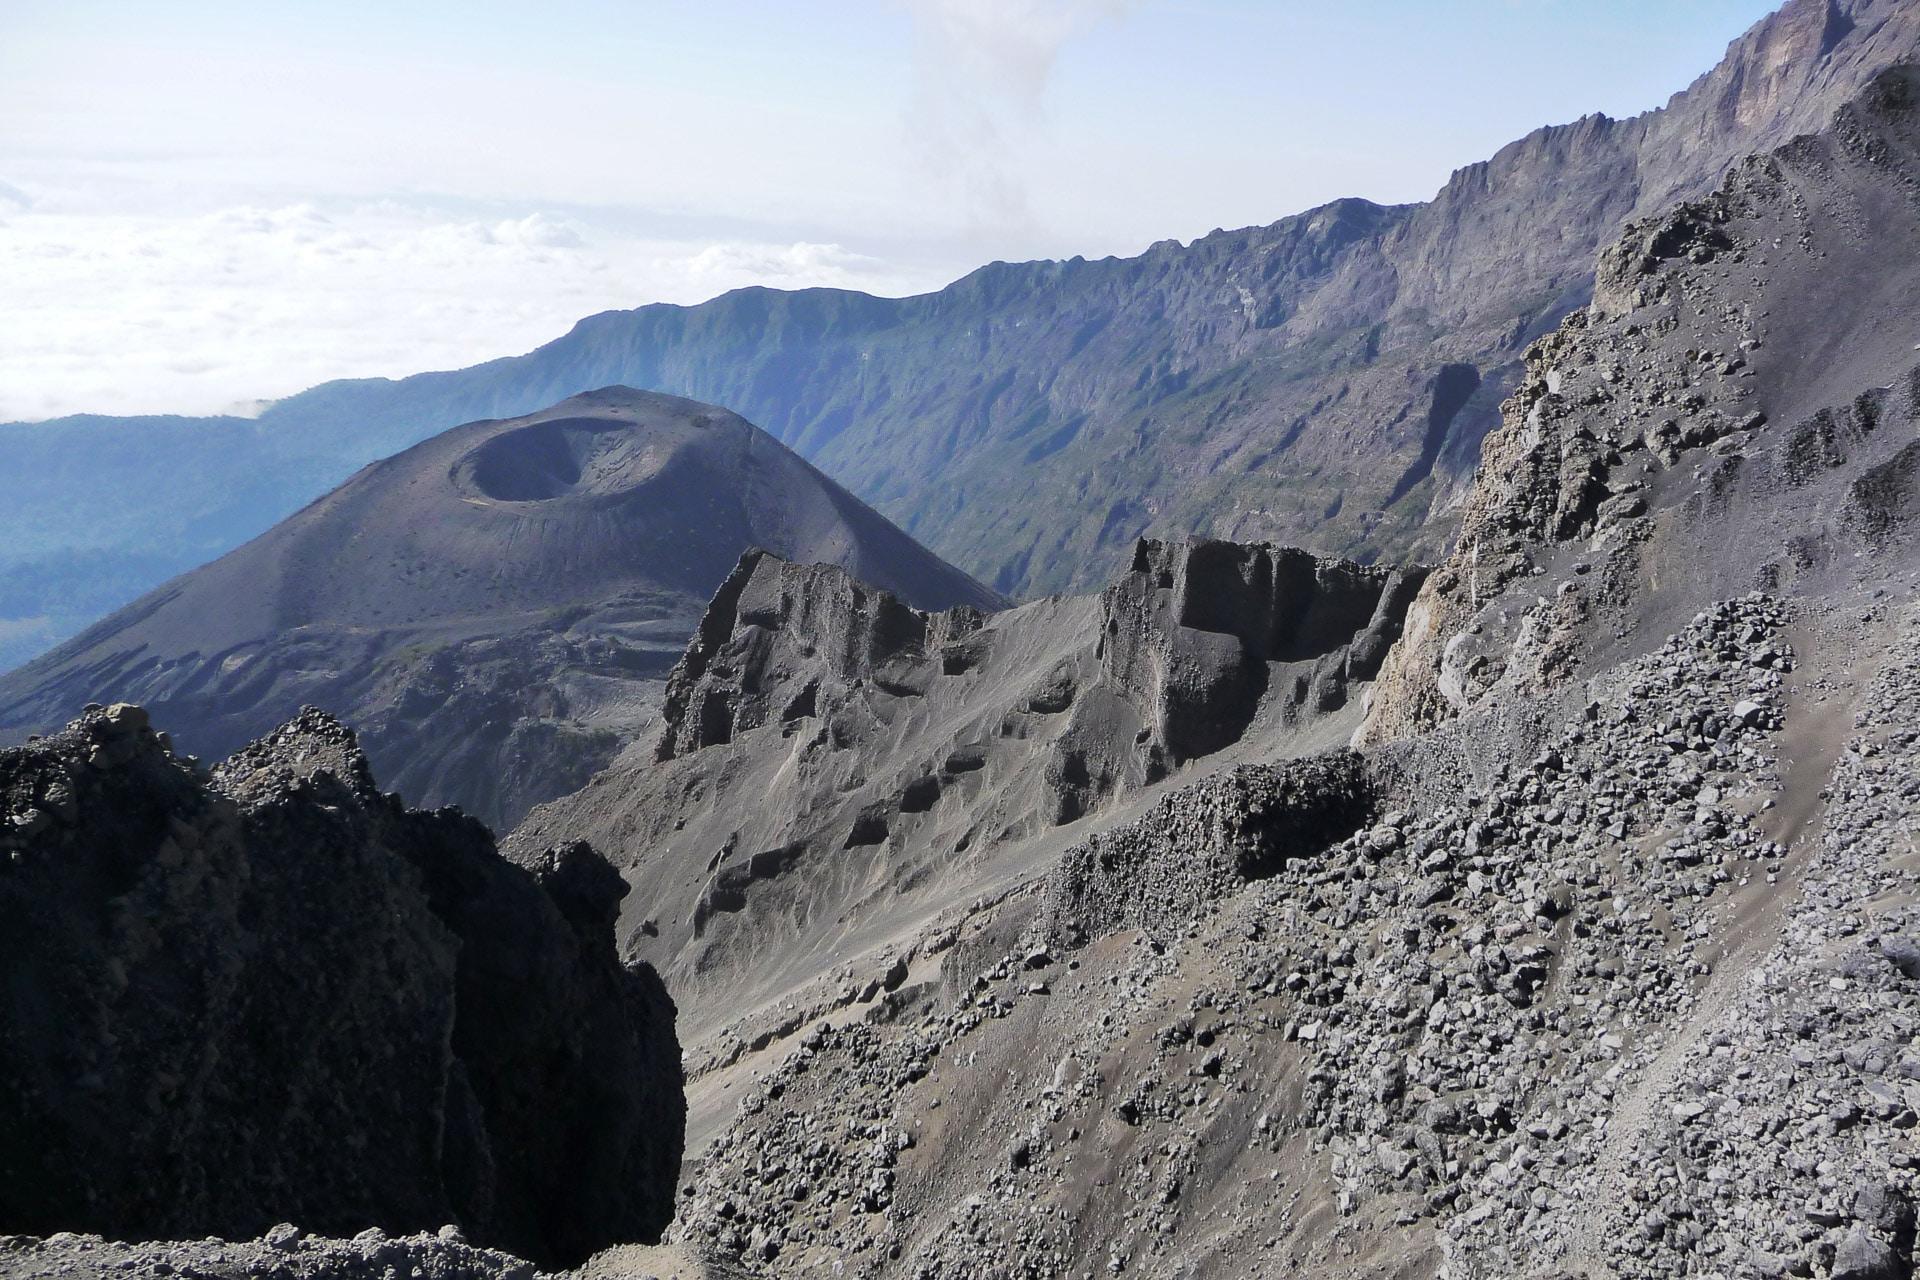 Mount-Meru-Arusha-Nationalpark-Tansania-Globetrotter-Select-Boehm-48